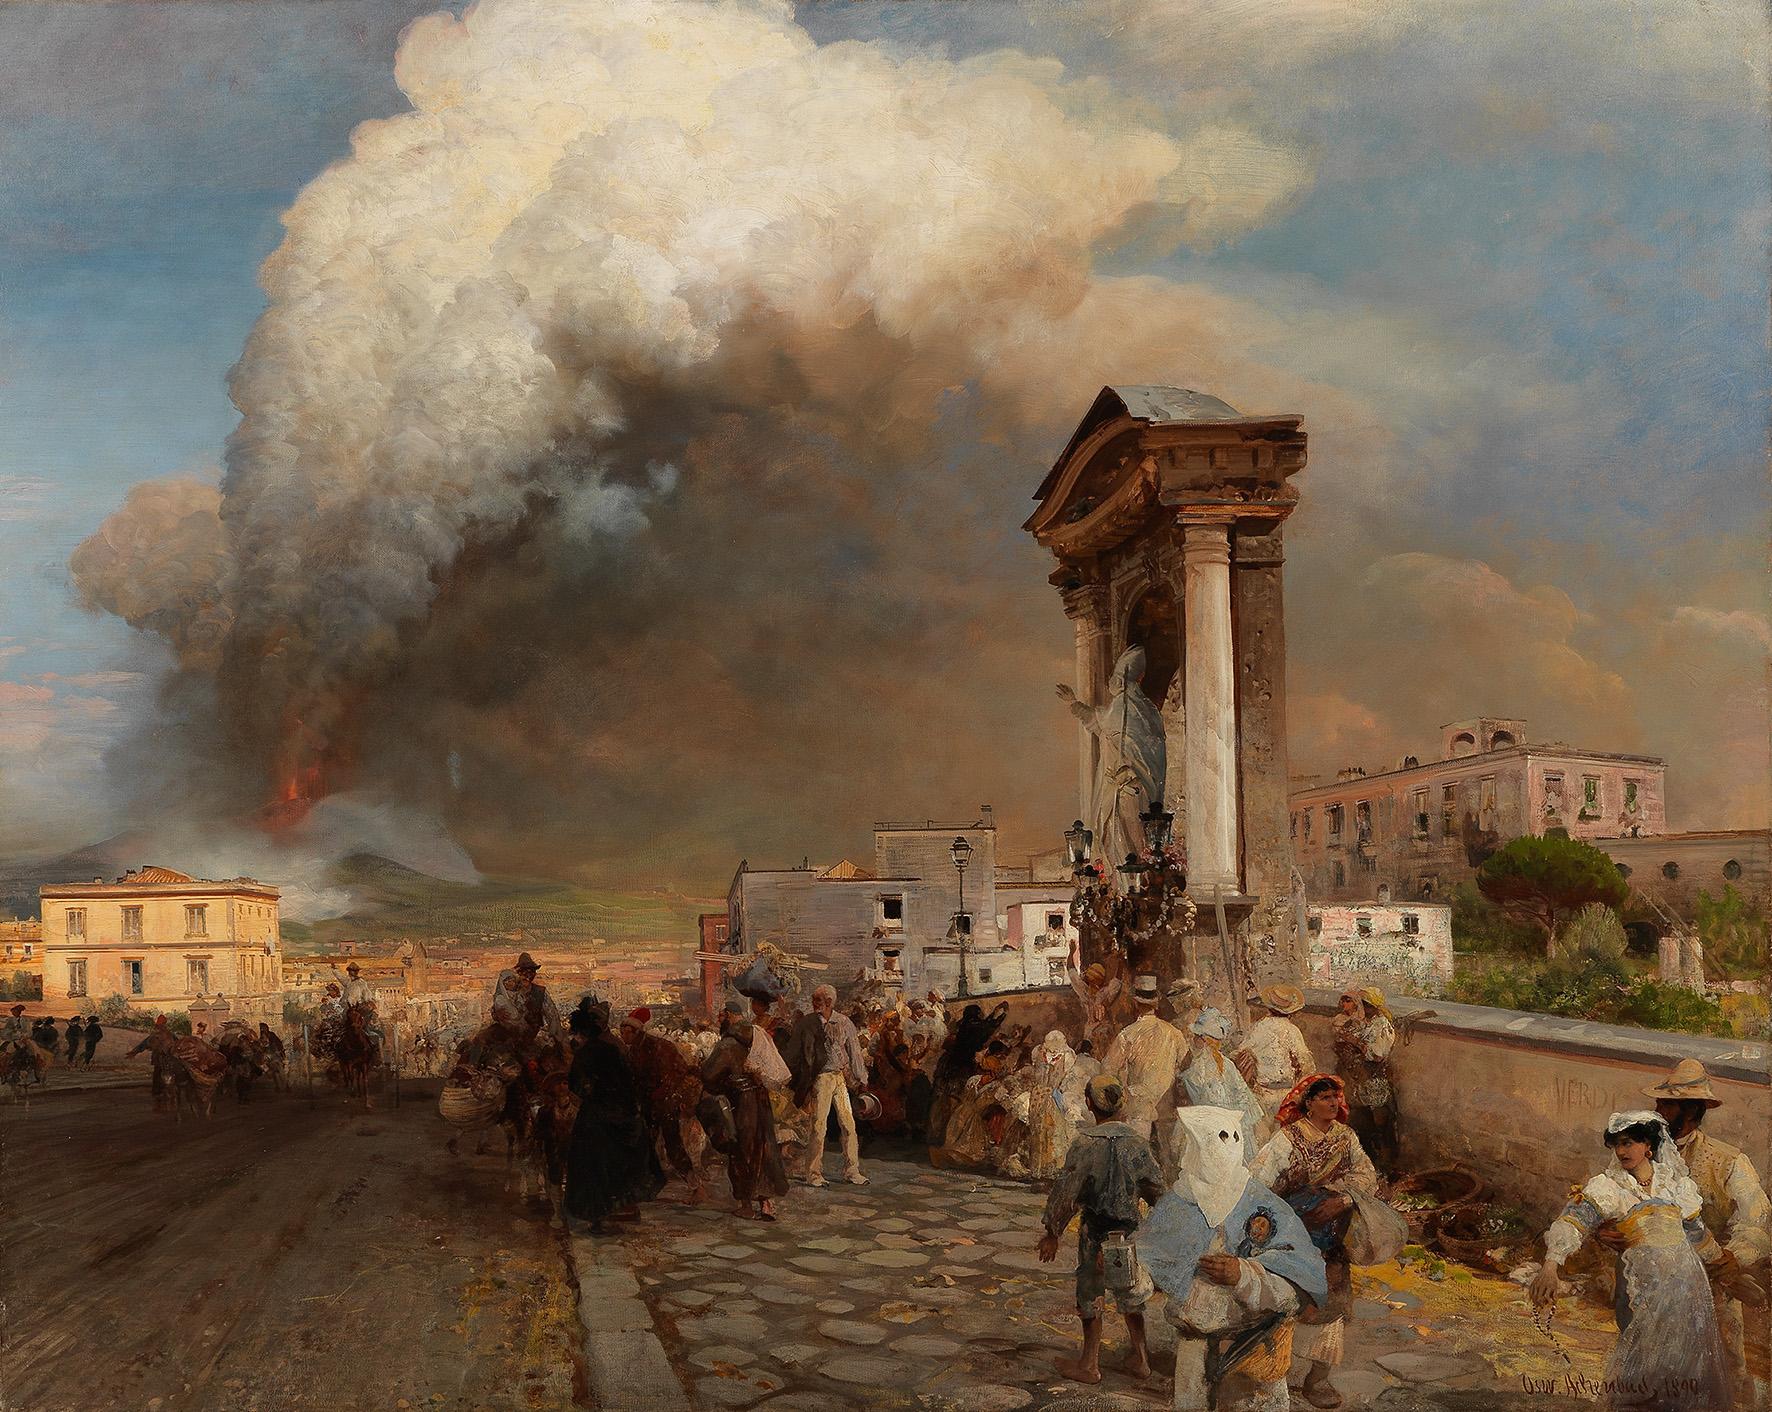 Oswald Achenbach (1827-1905), « Eruption of Vesuvius », image ©Dorotheum